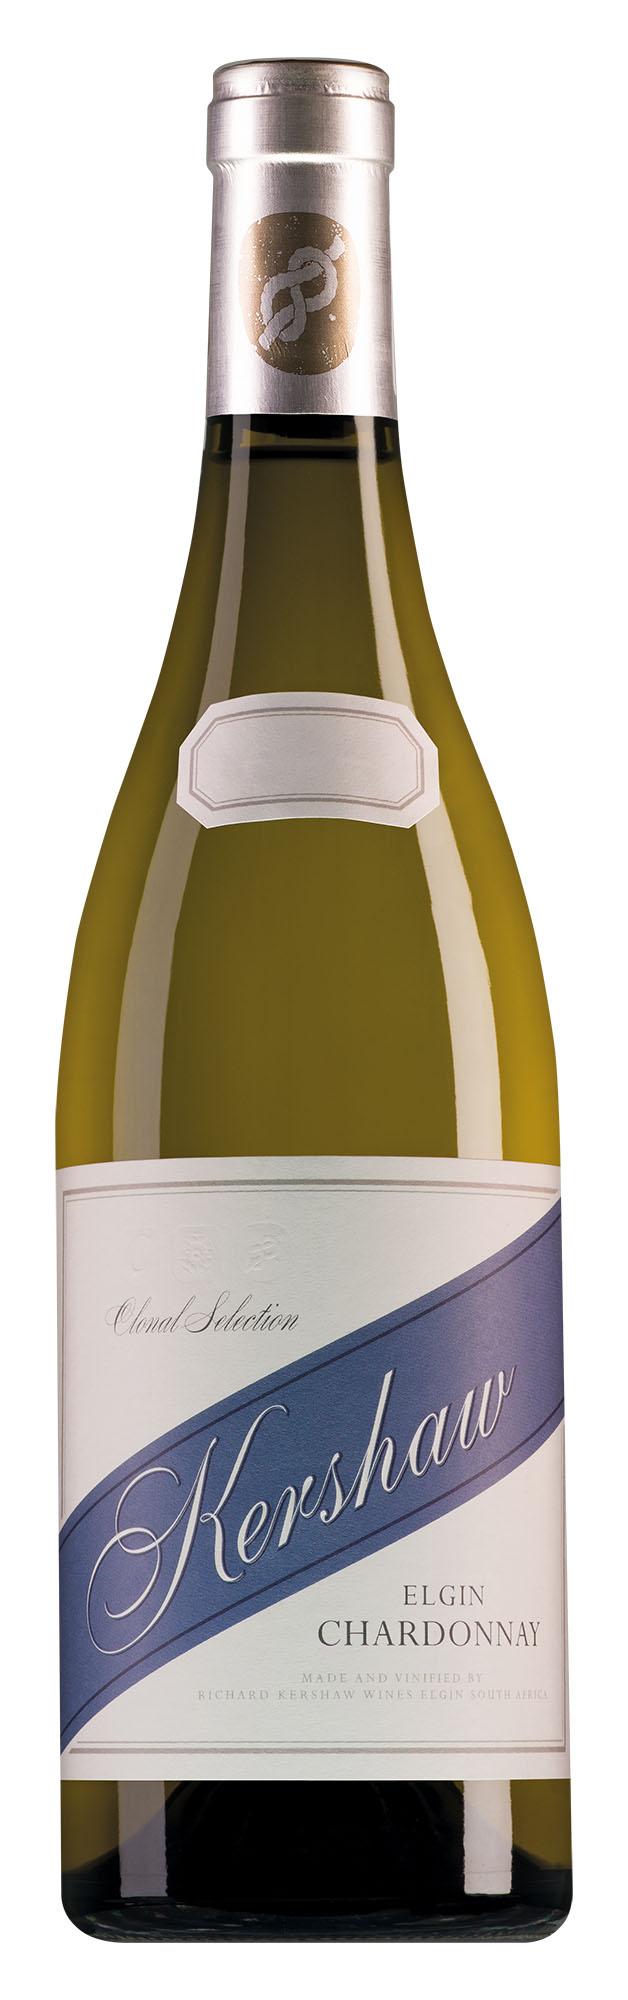 Kershaw Wines Elgin Clonal Selection Chardonnay